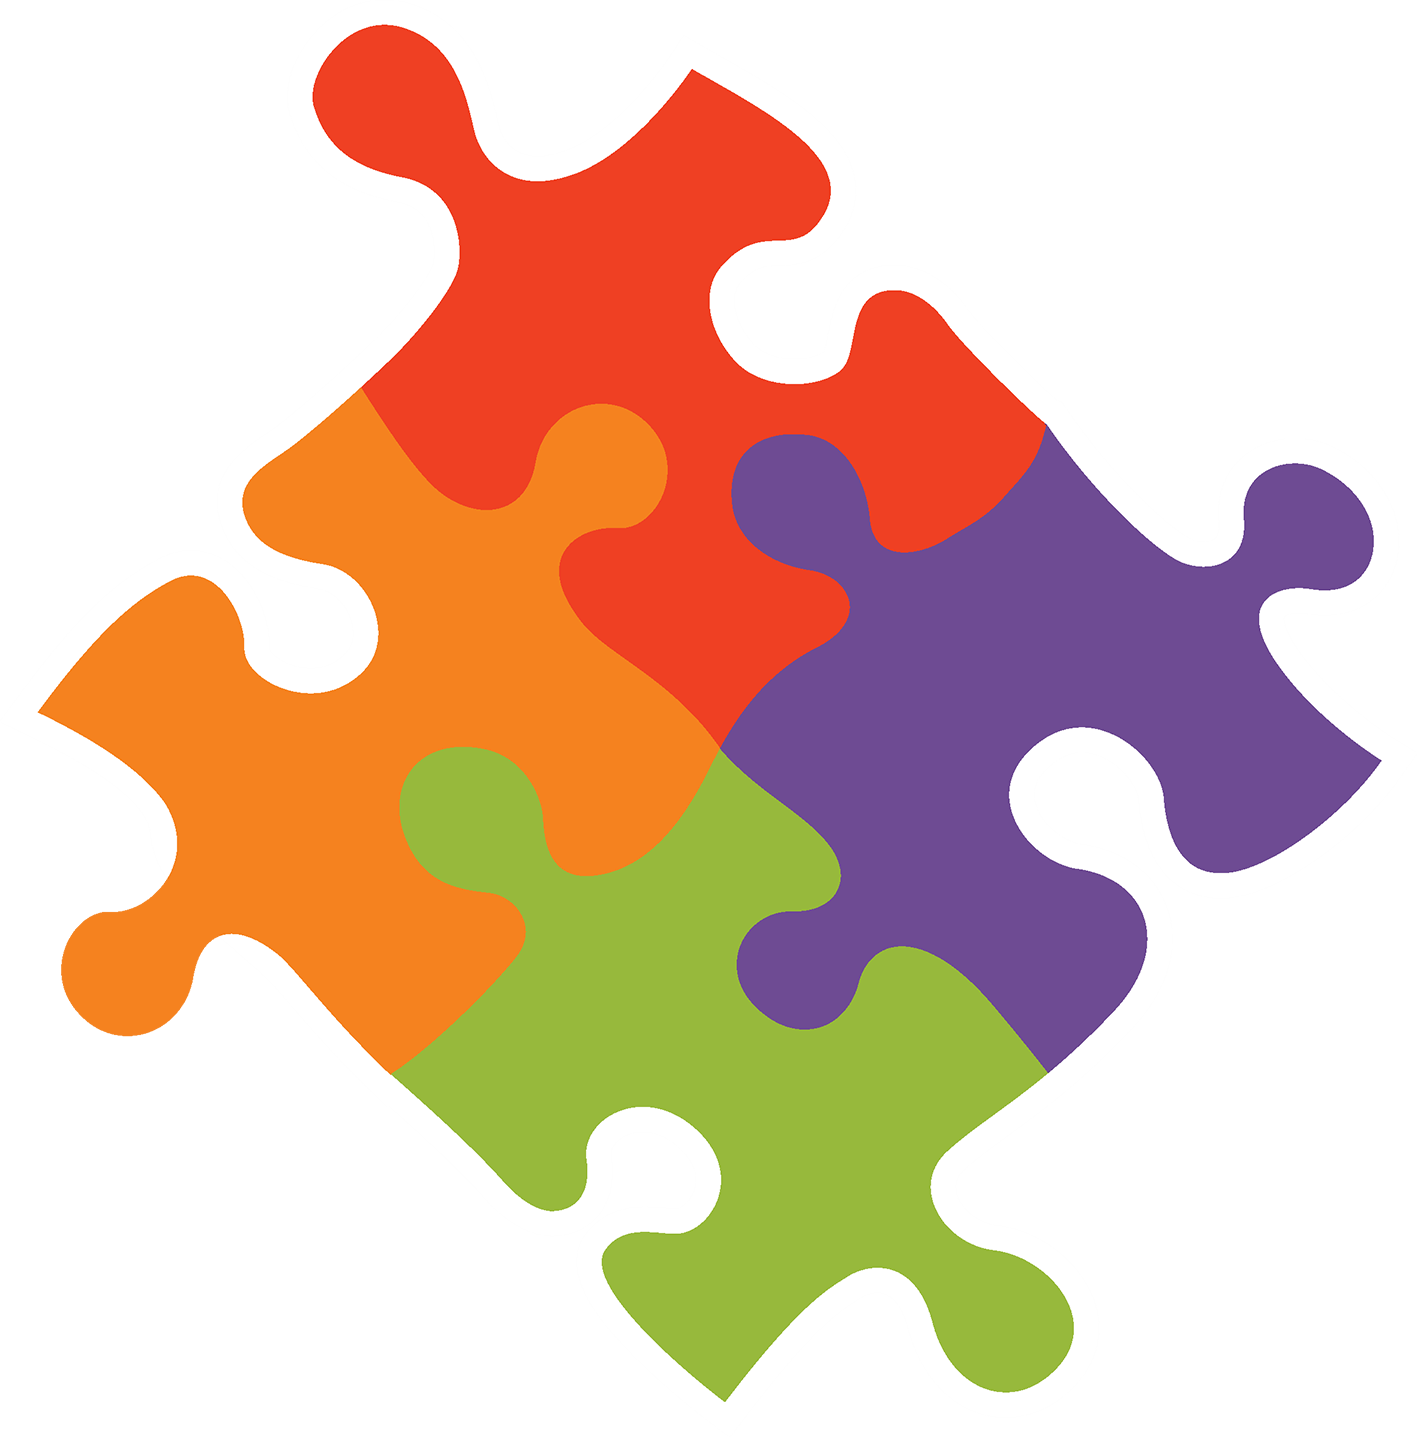 Extratime puzzle piece logo